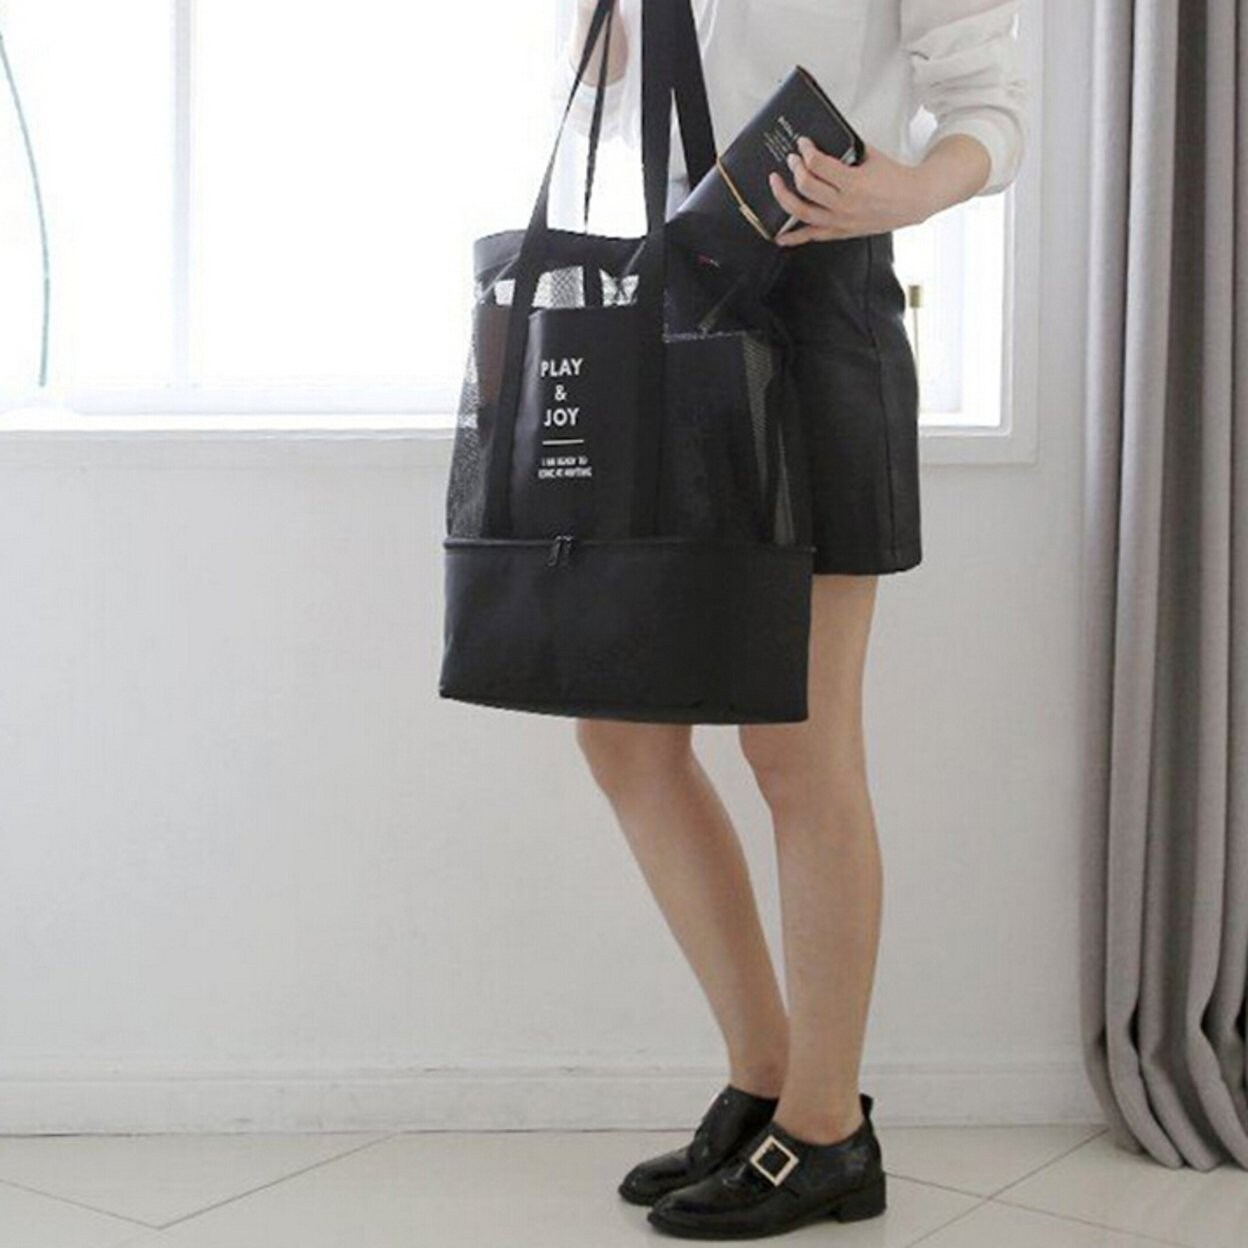 849bb54f6d65 Picnic Bag - 2 In 1 Mesh Beach Tote Bag With Food Cooler